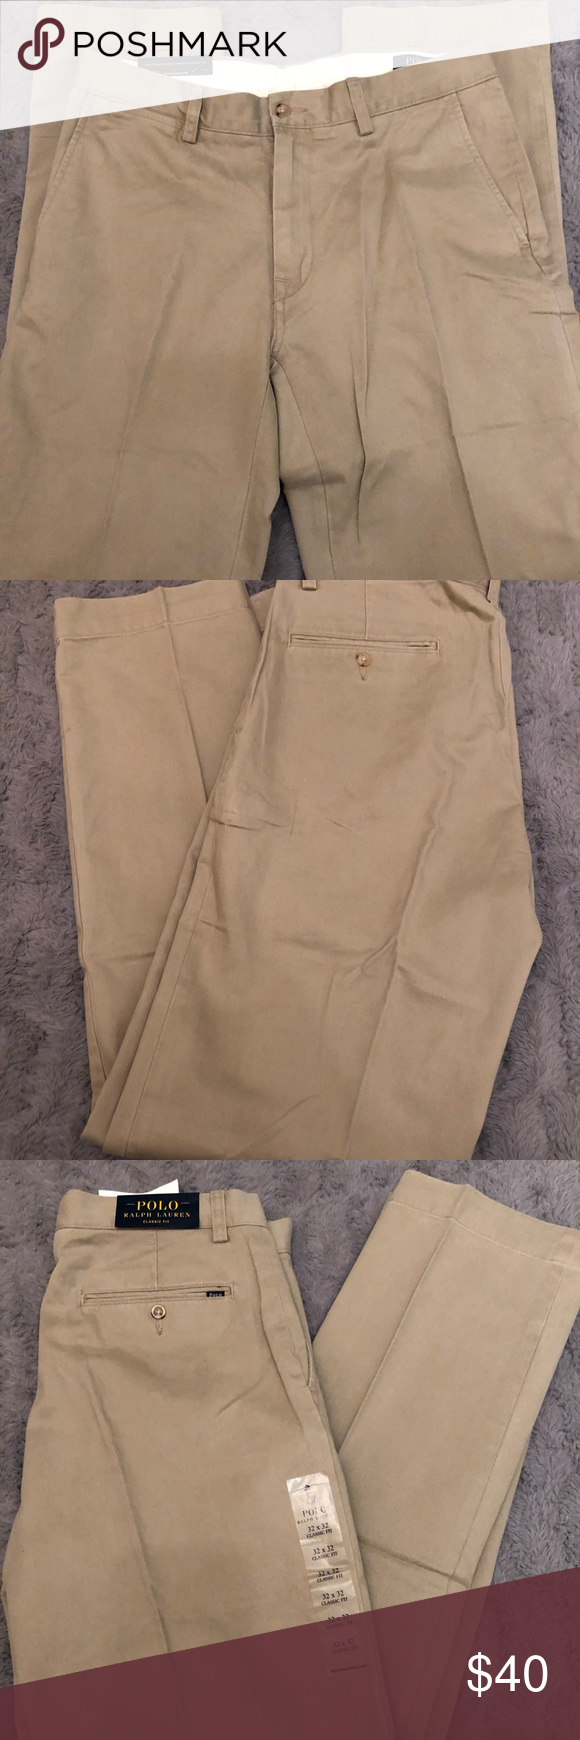 Men's Slacks Khaki Polo Size 32x32 w8PkX0nO